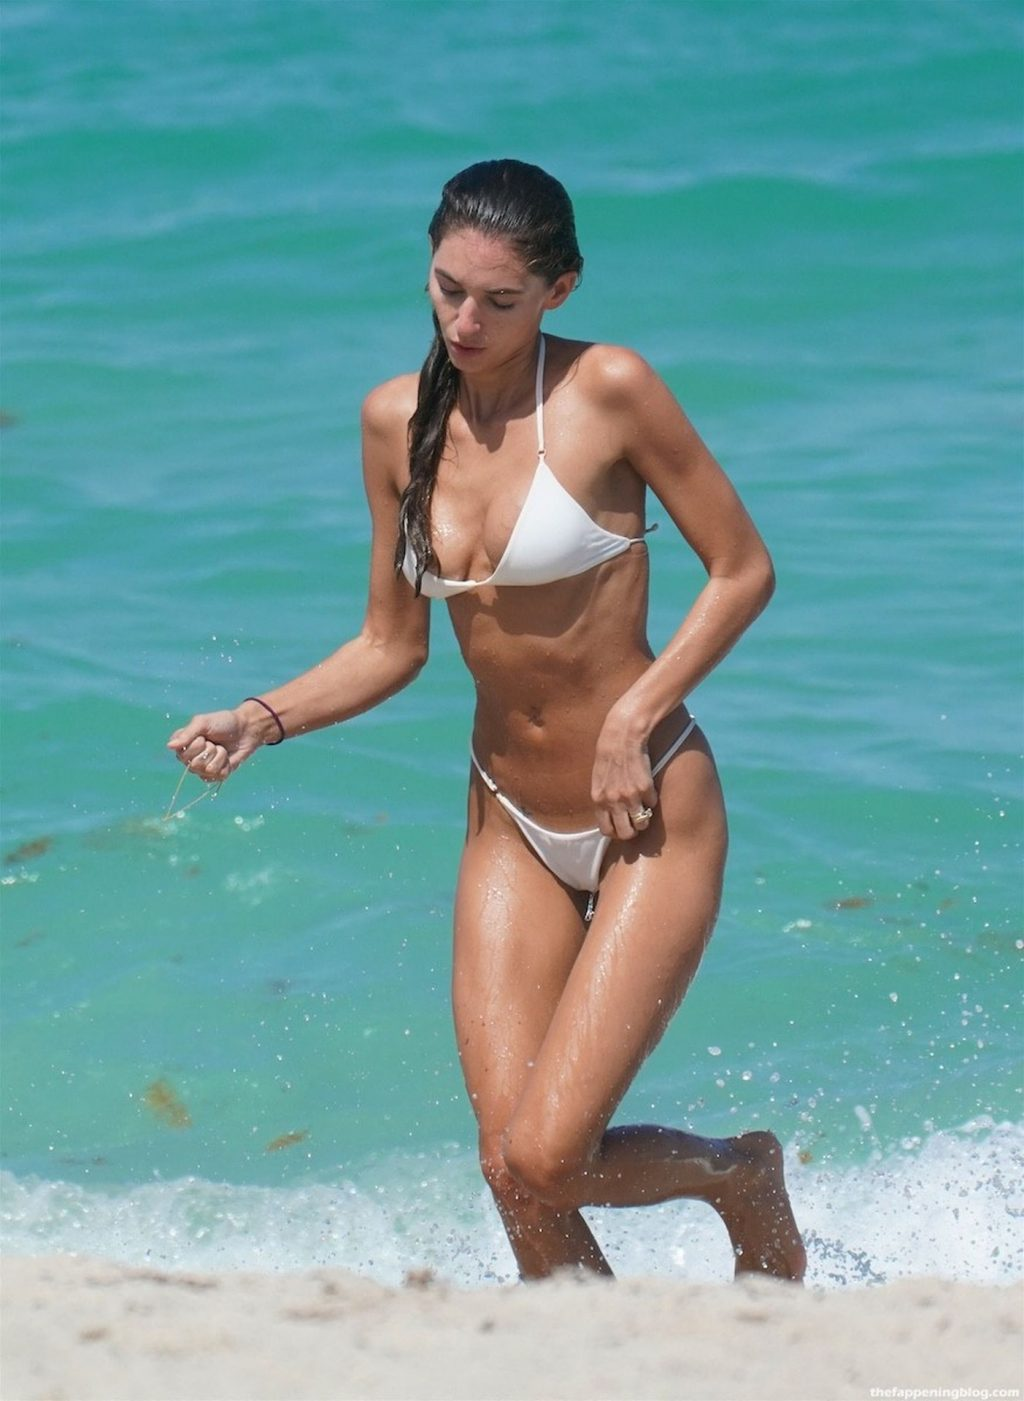 Debbie St. Pierre Stuns in a White Bikini at the Beach in Miami (29 Photos)